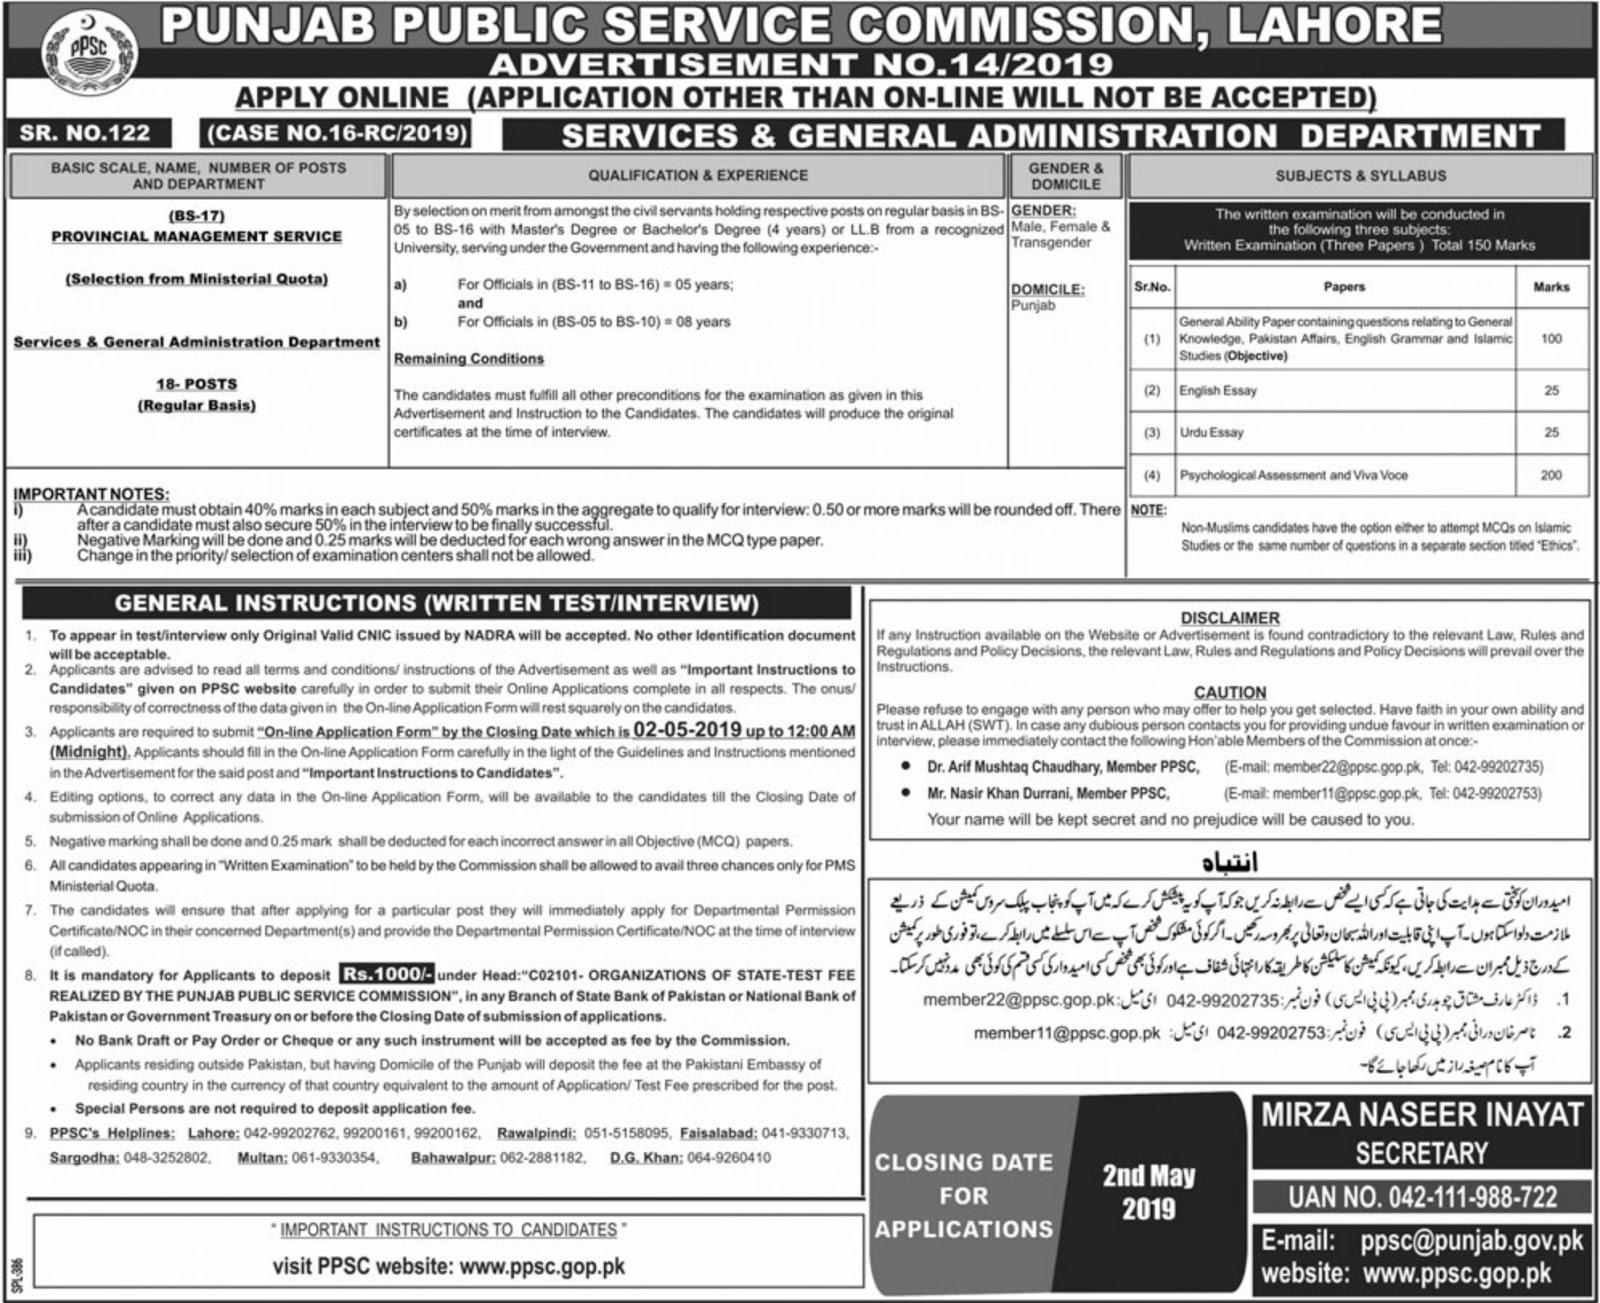 PPSC Jobs 2019 For PMS | Provincial Management Service (BS-17)